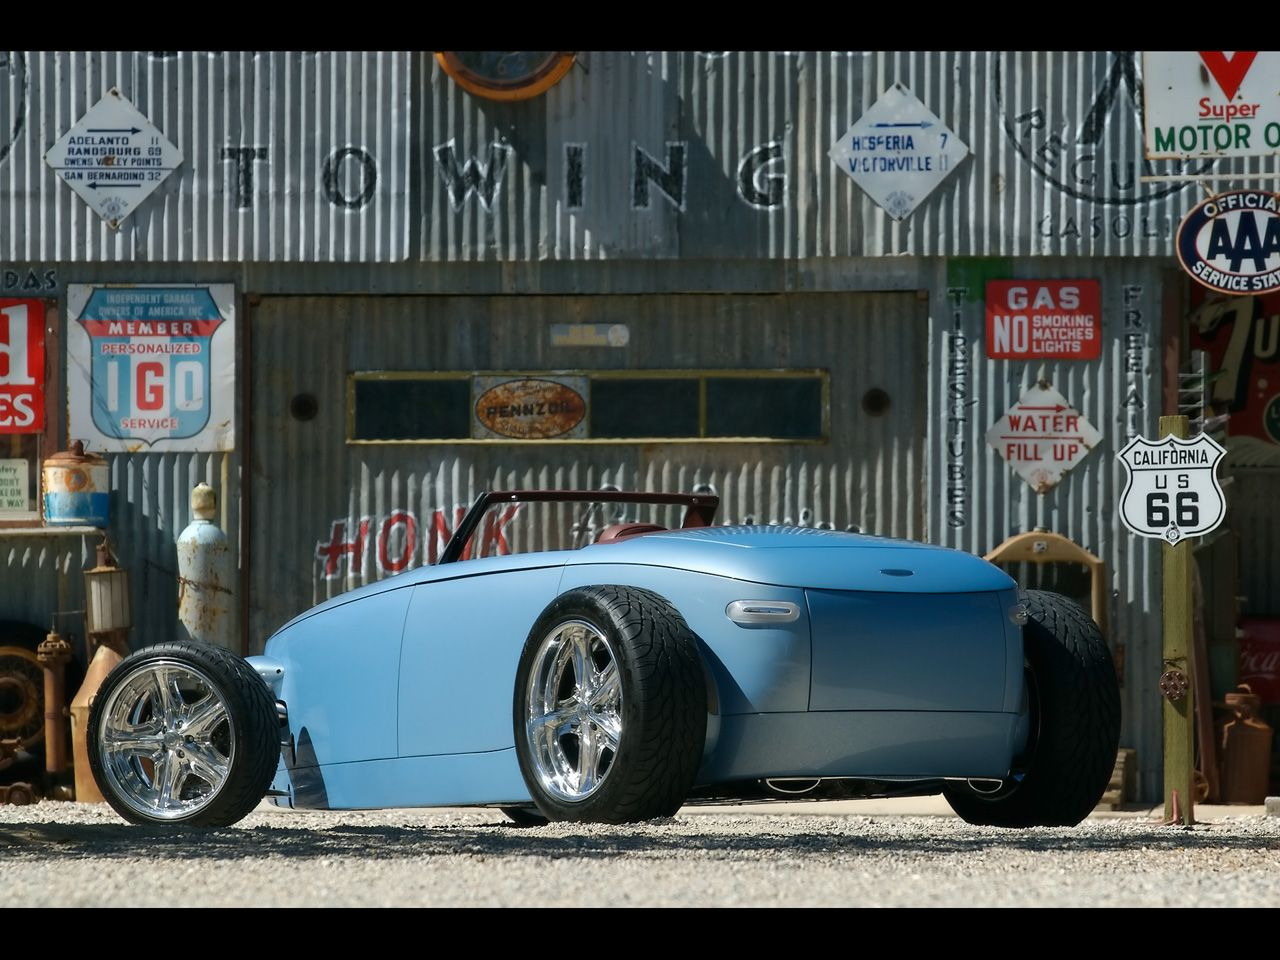 Volvo hotrods: Caresto V8 speedster and Jakob | AmcarGuide.com